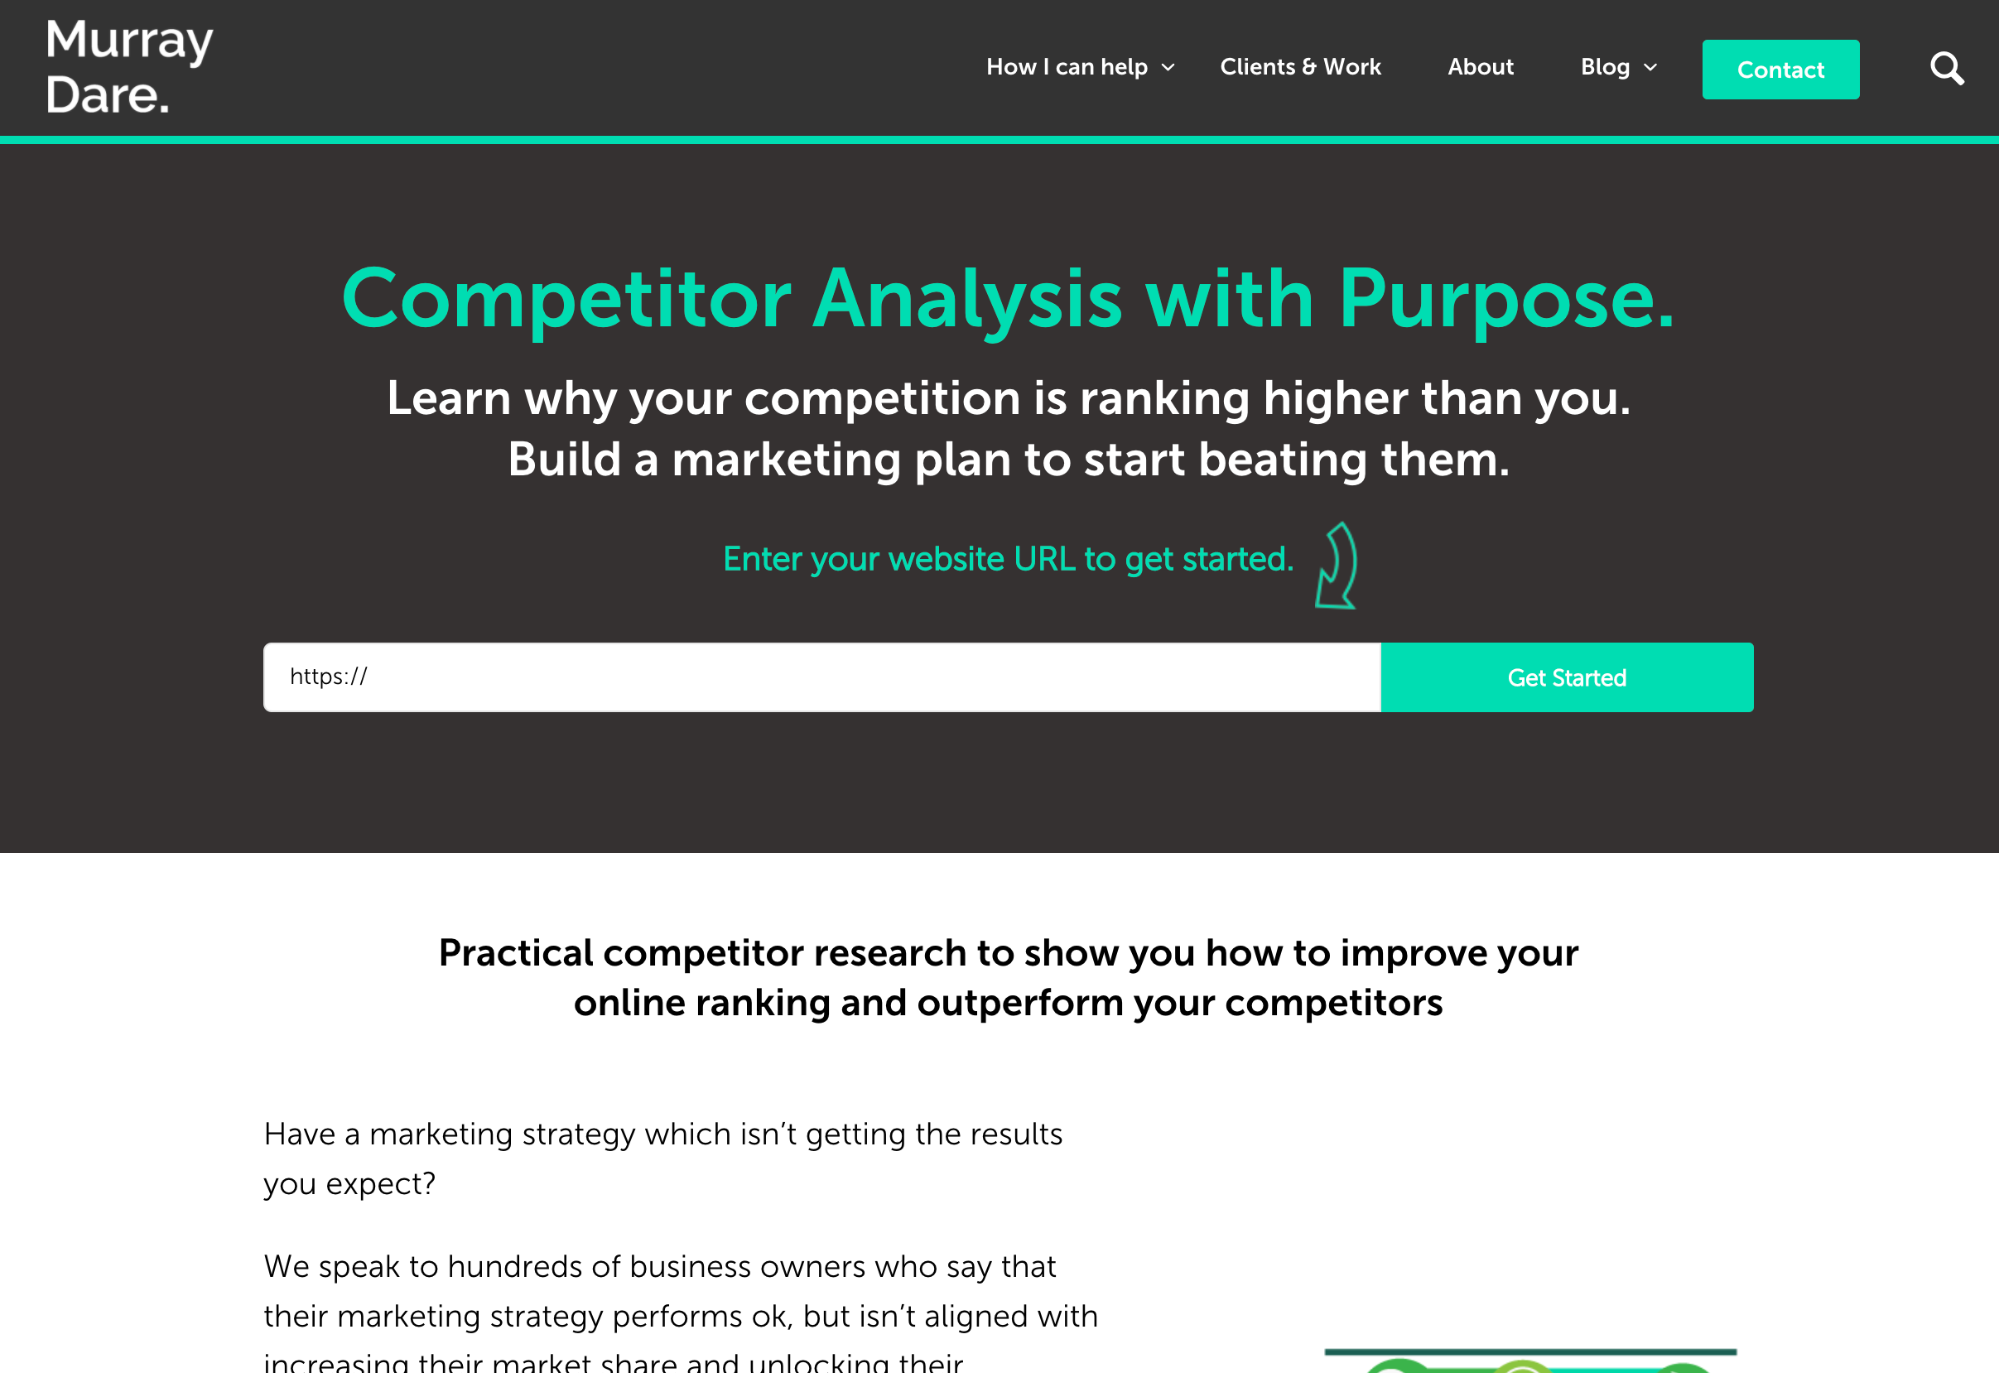 murray dare marketing consultancy competitor analysis with purpose